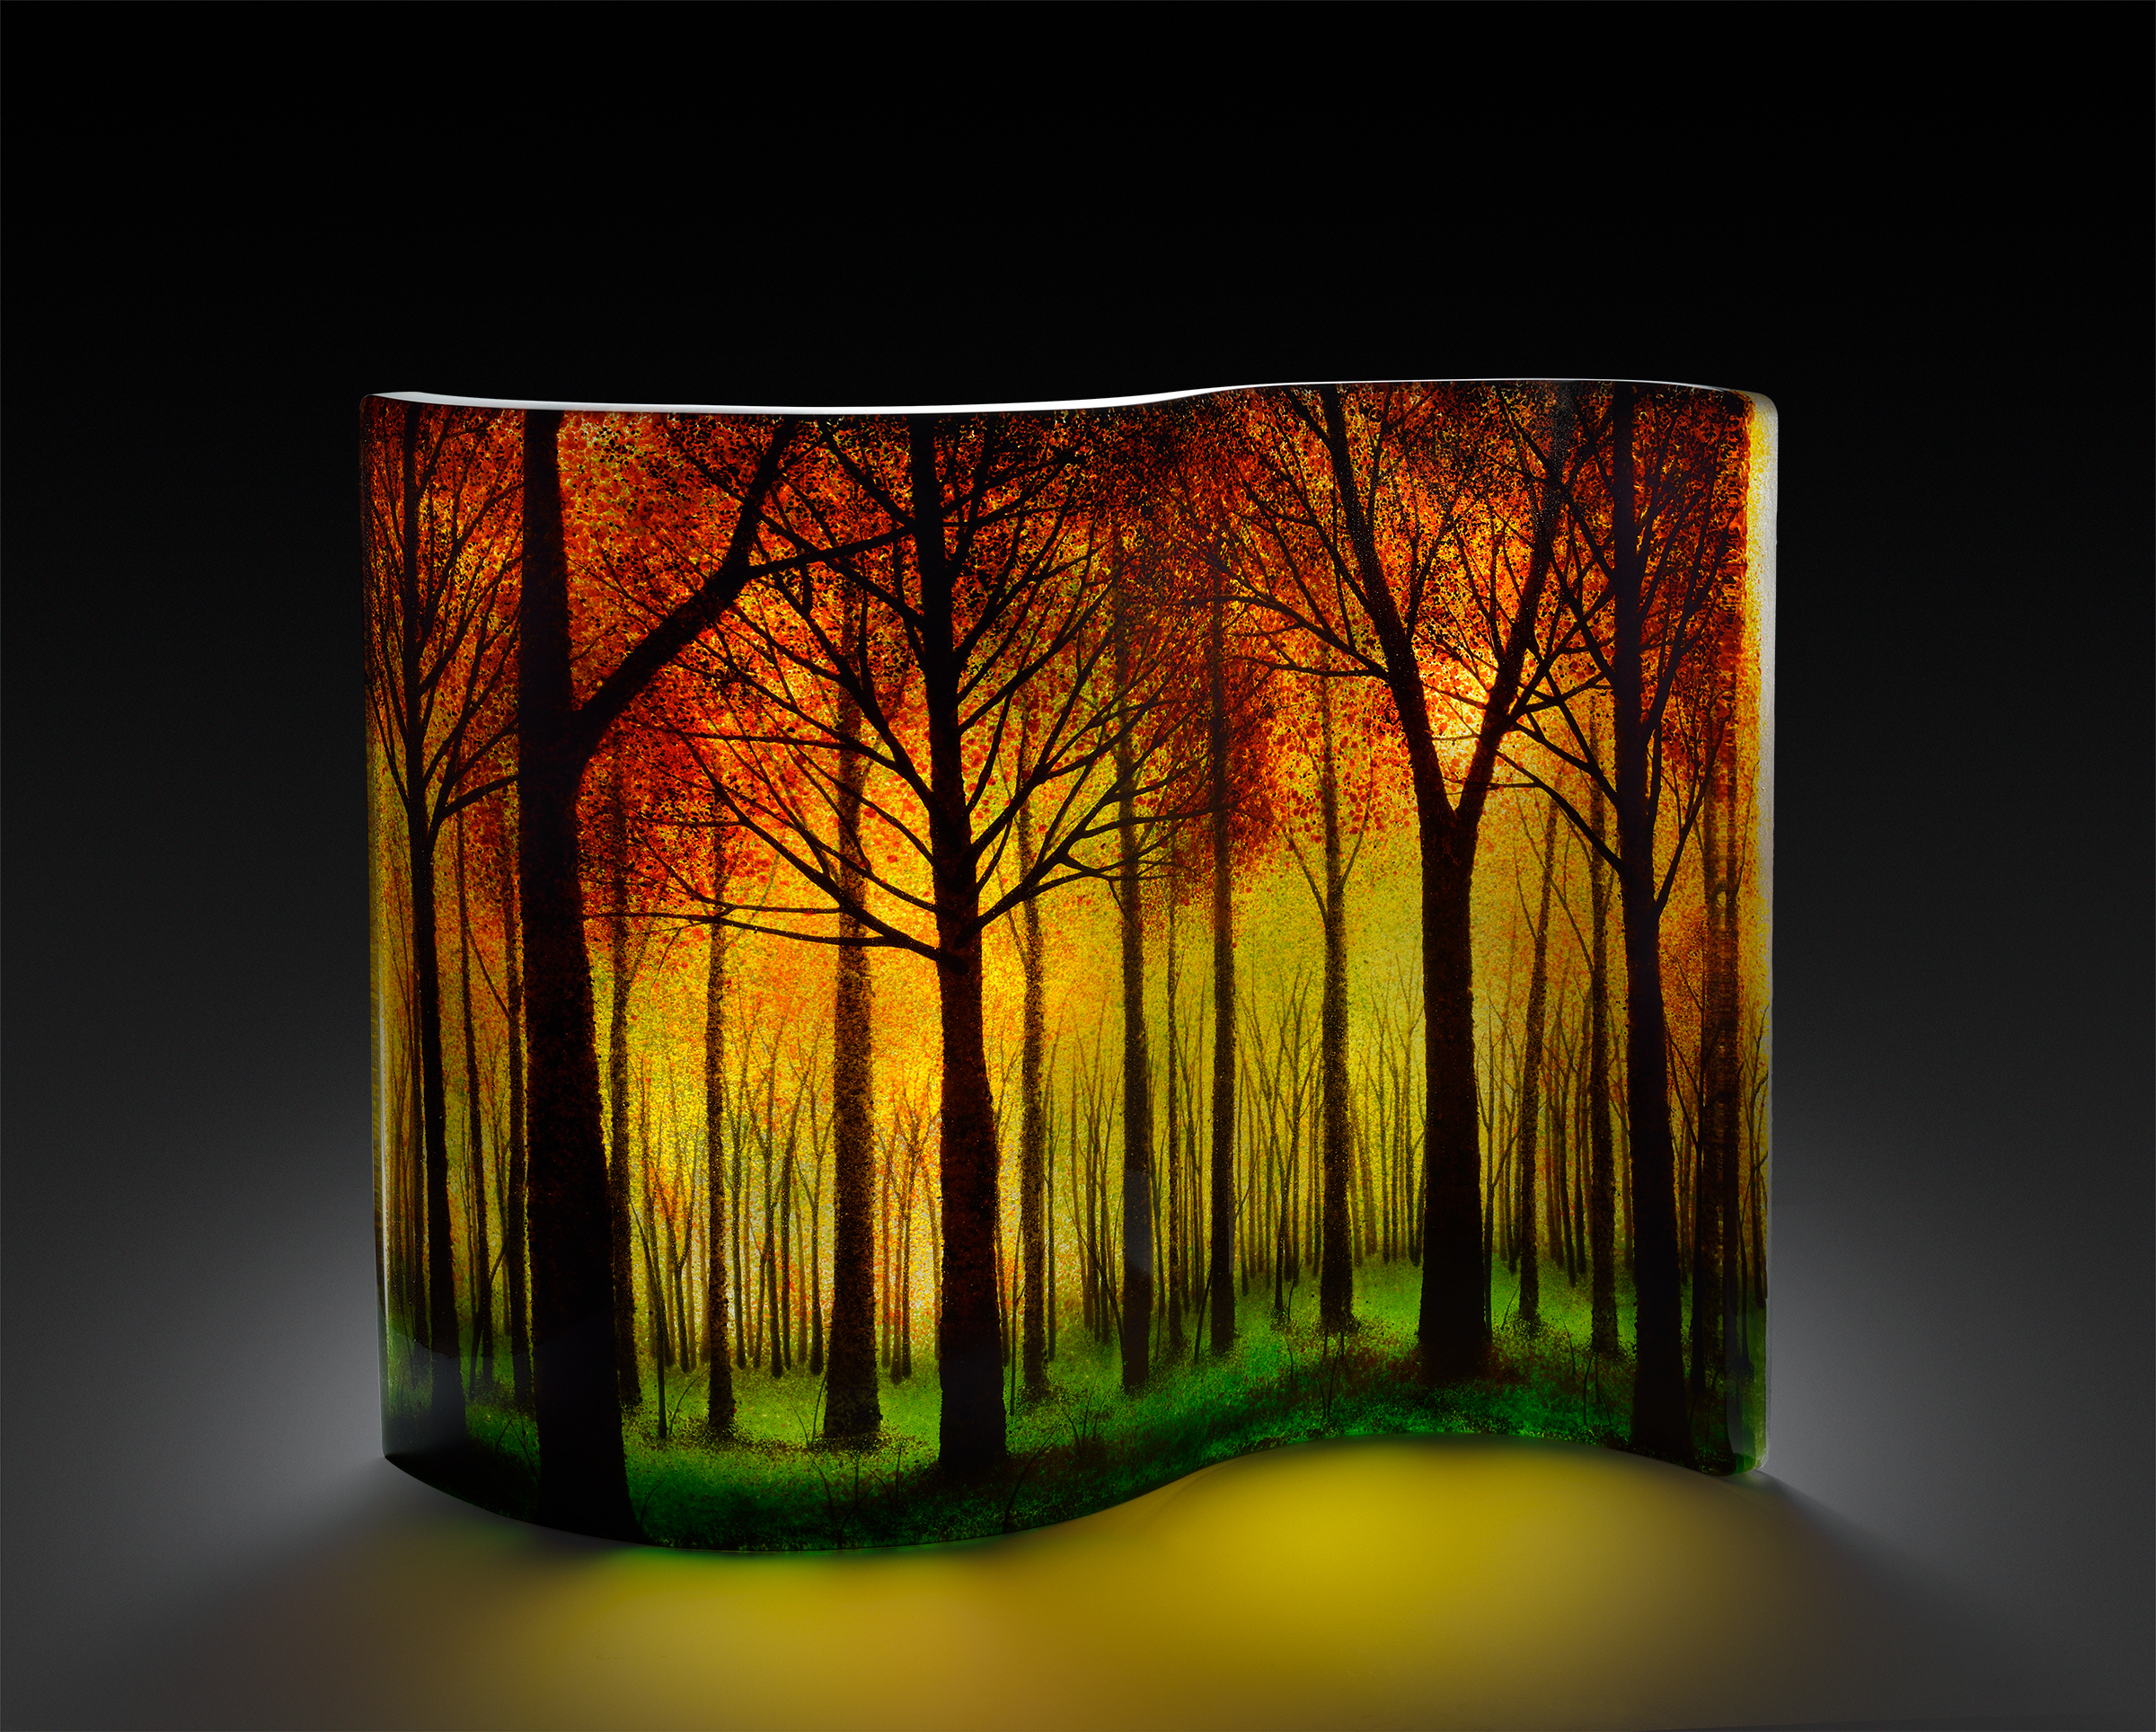 Fall-Trees-v2.jpg